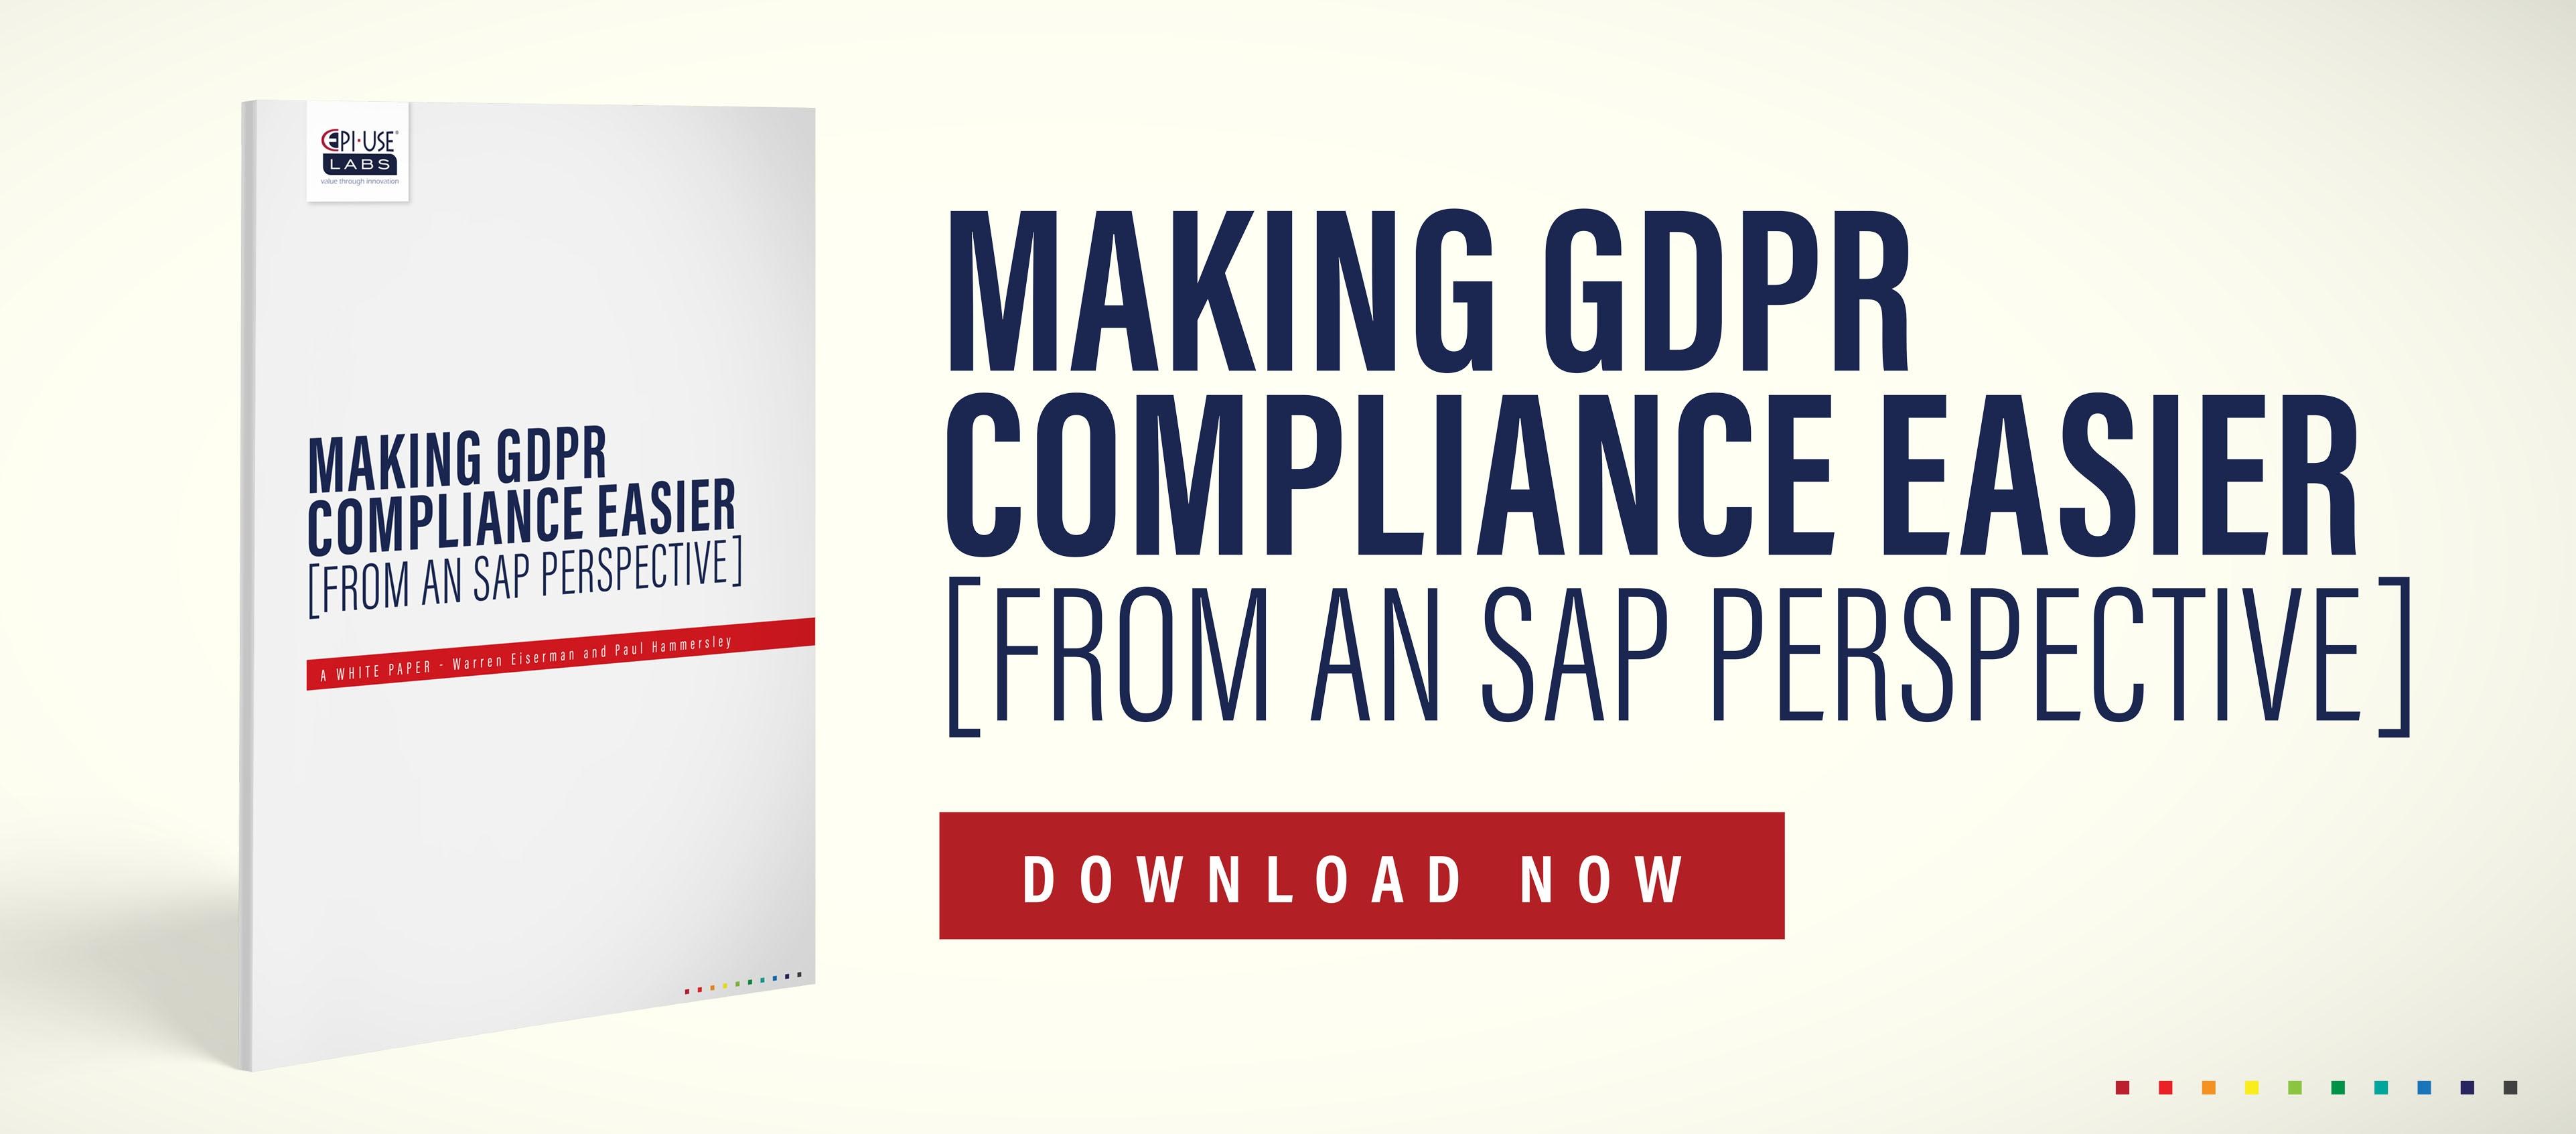 Making GDPR Compliance easier